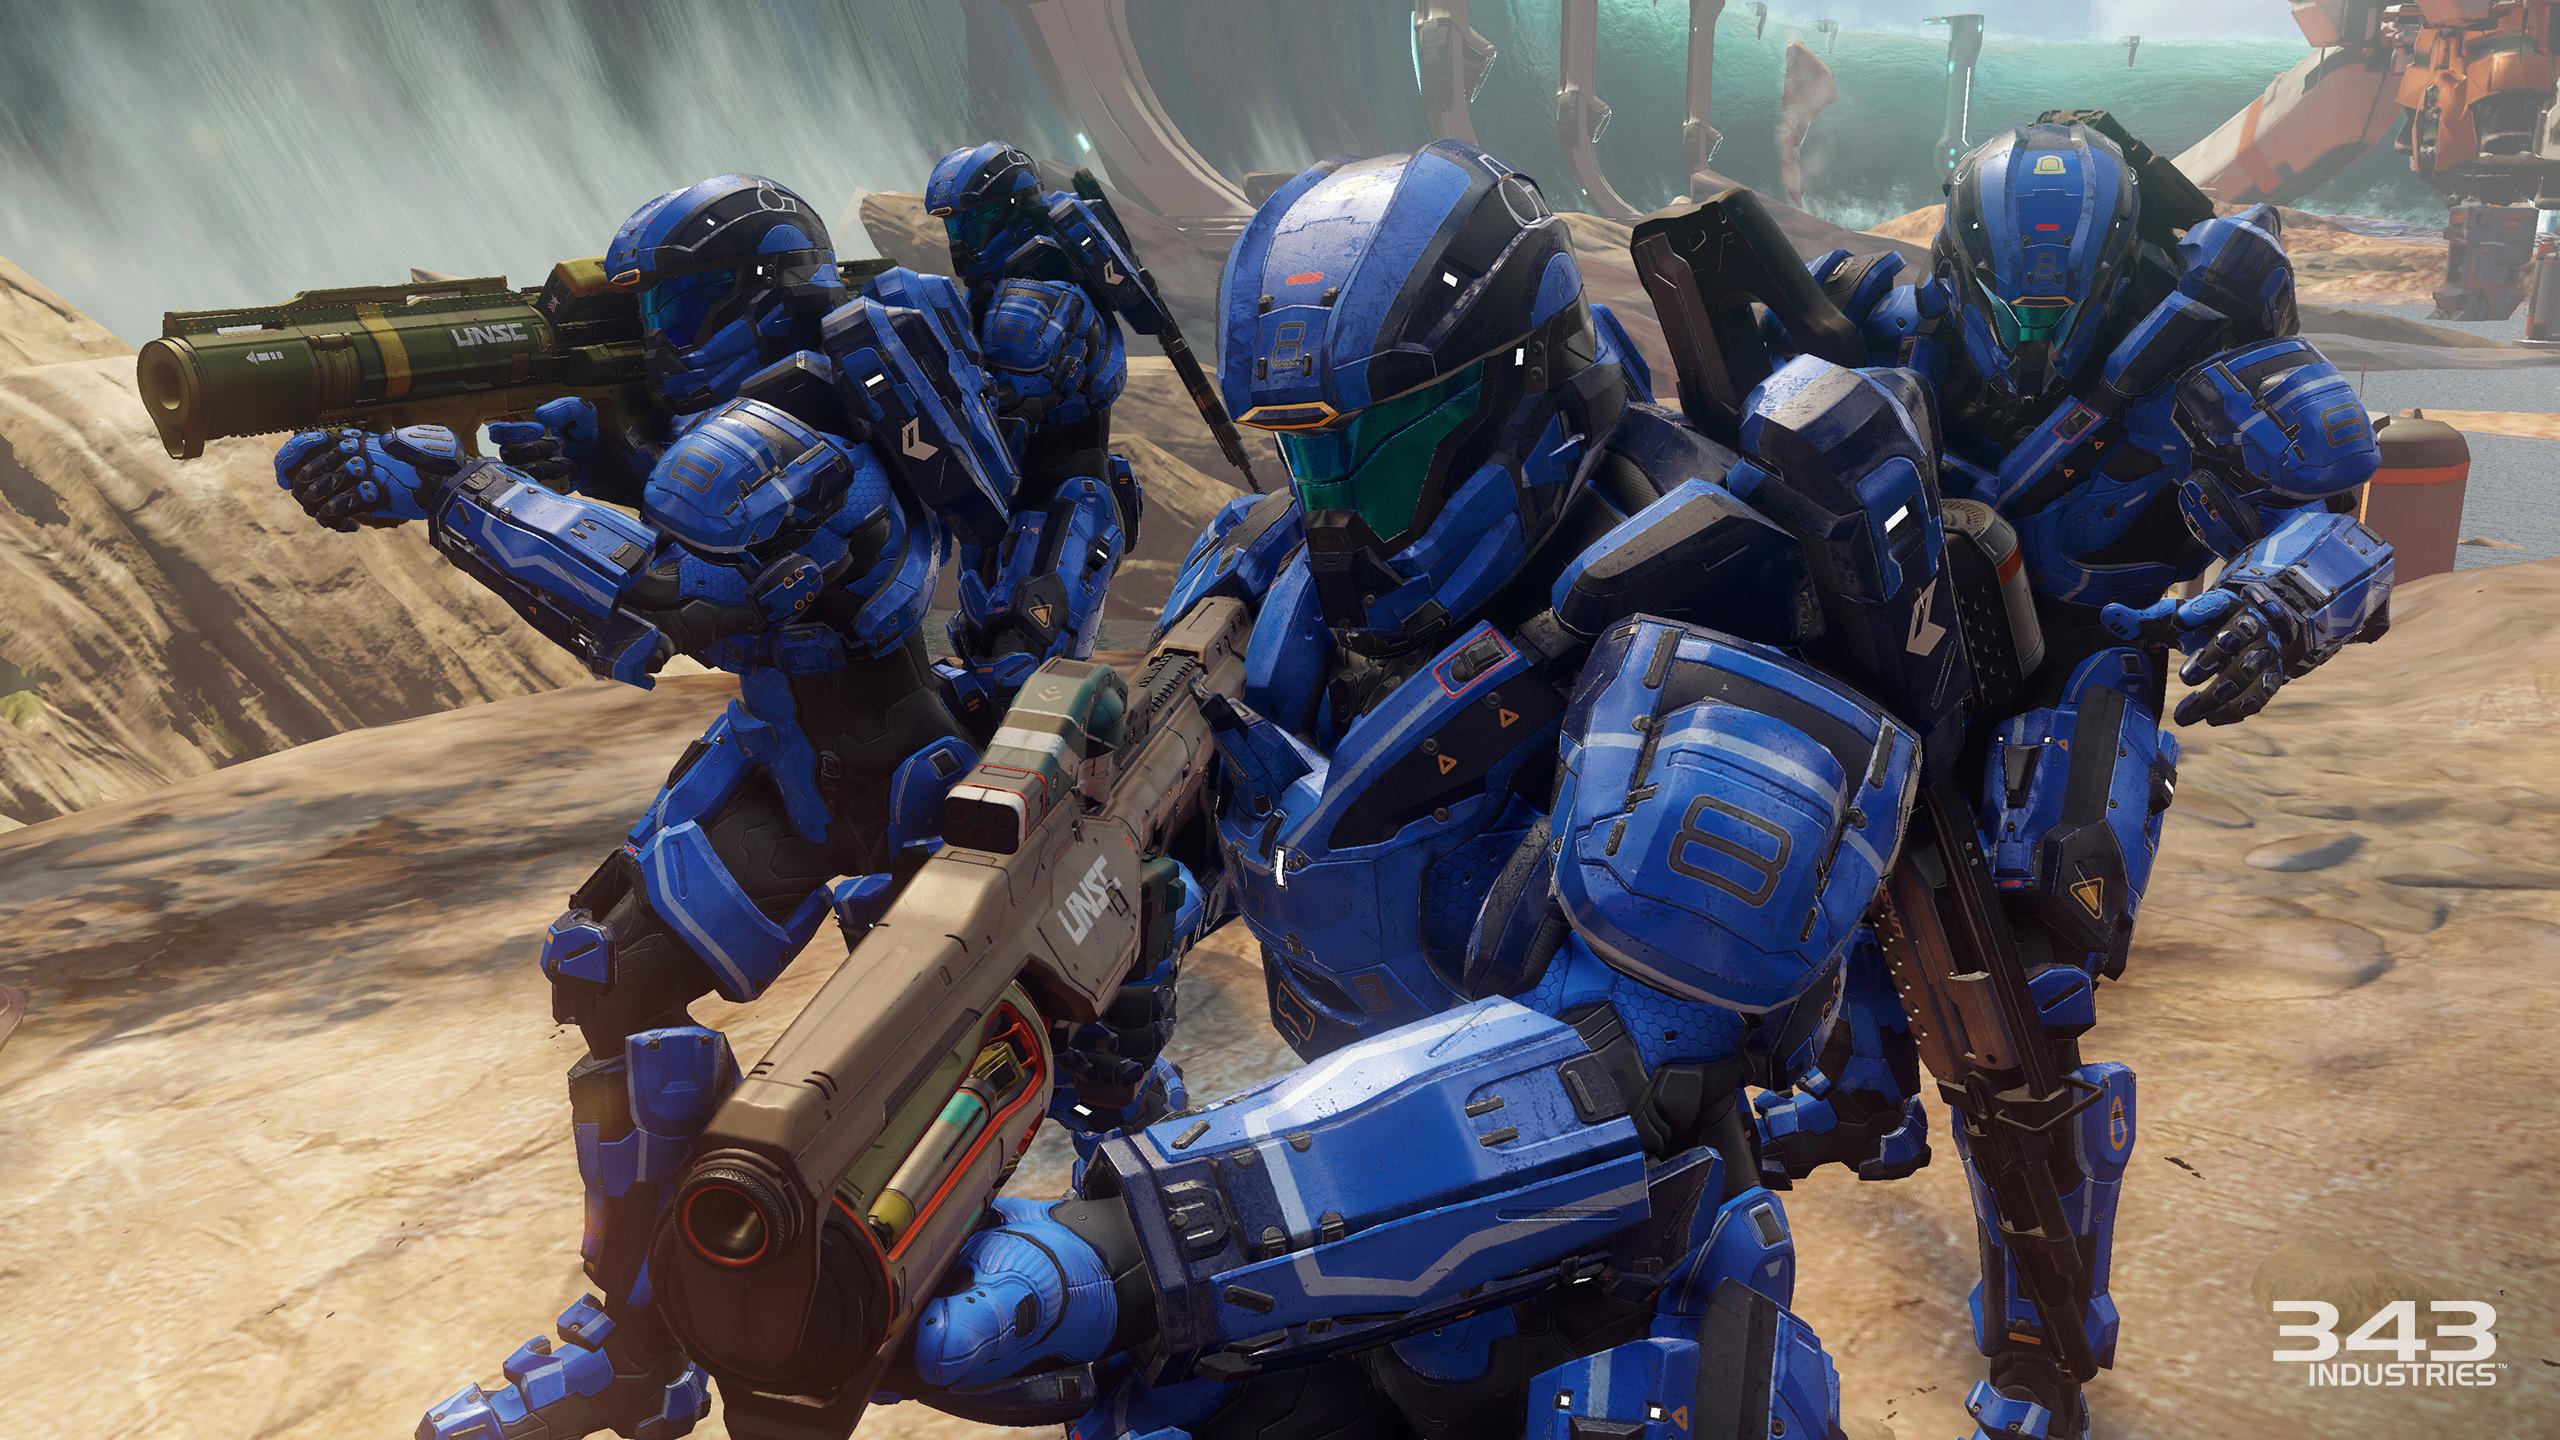 Halo 5 Preserves The Series Spirit Of Freedom Despite That